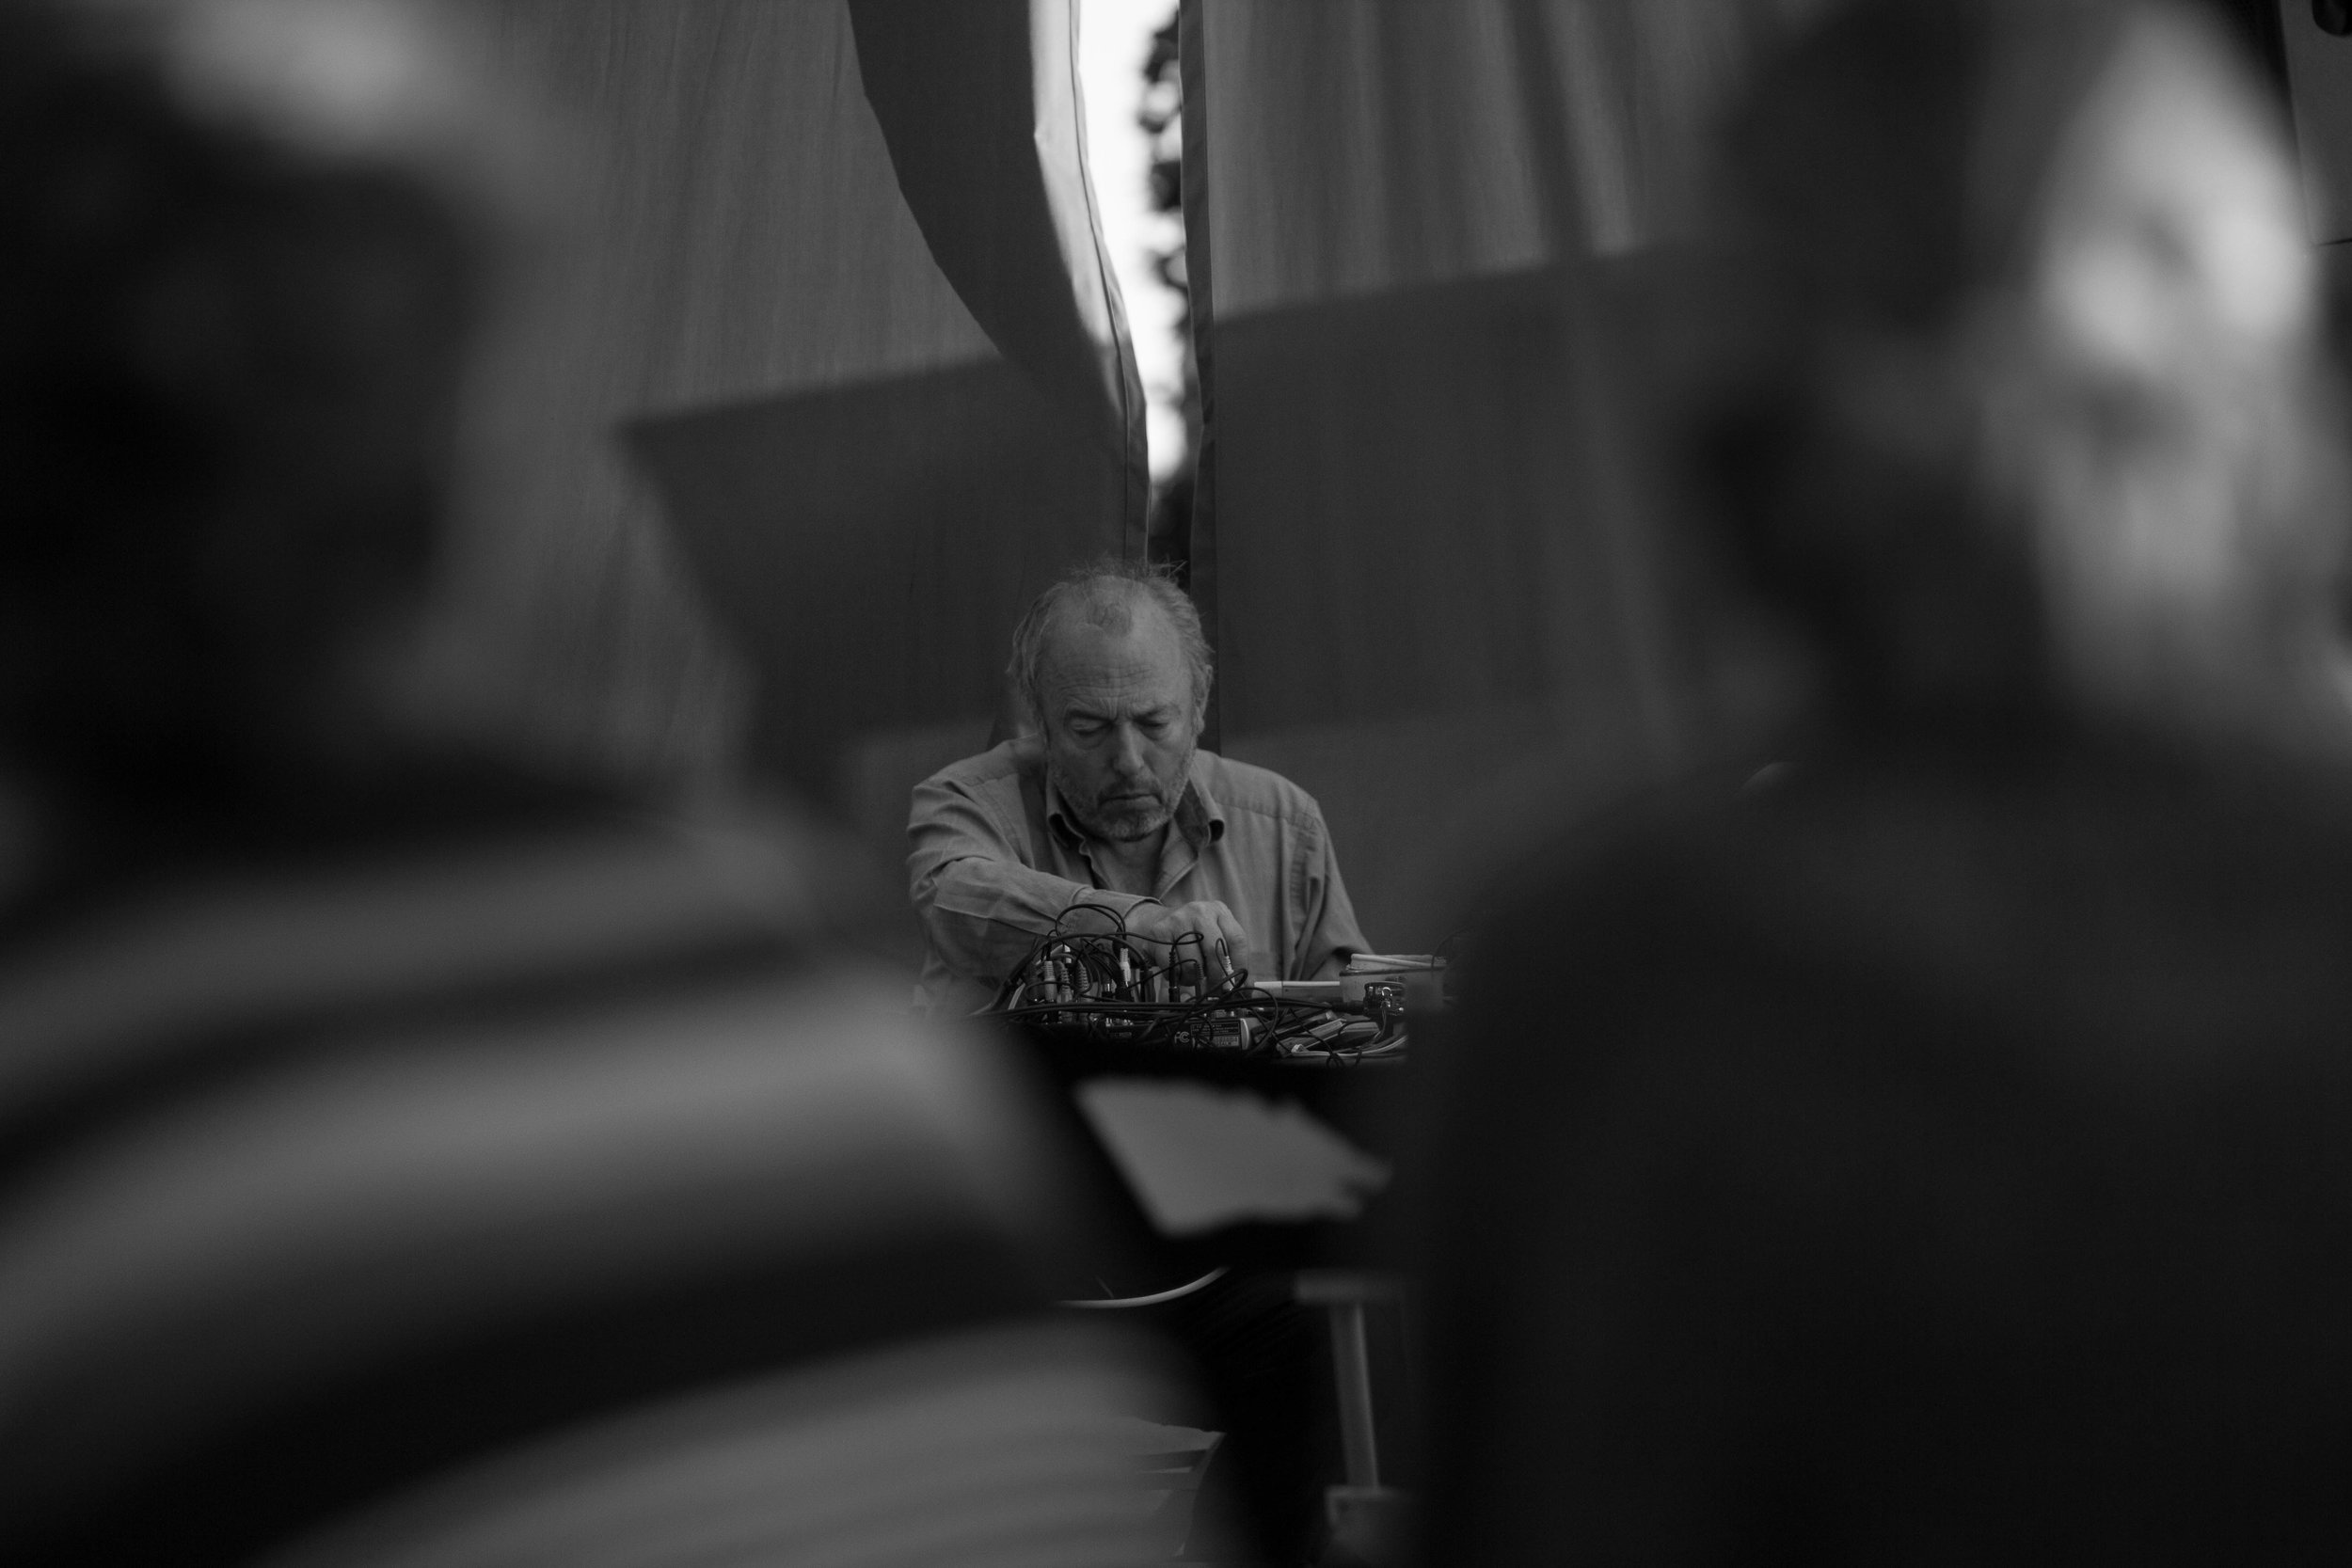 Philip Jeck. Live performance, Liverpool 2016